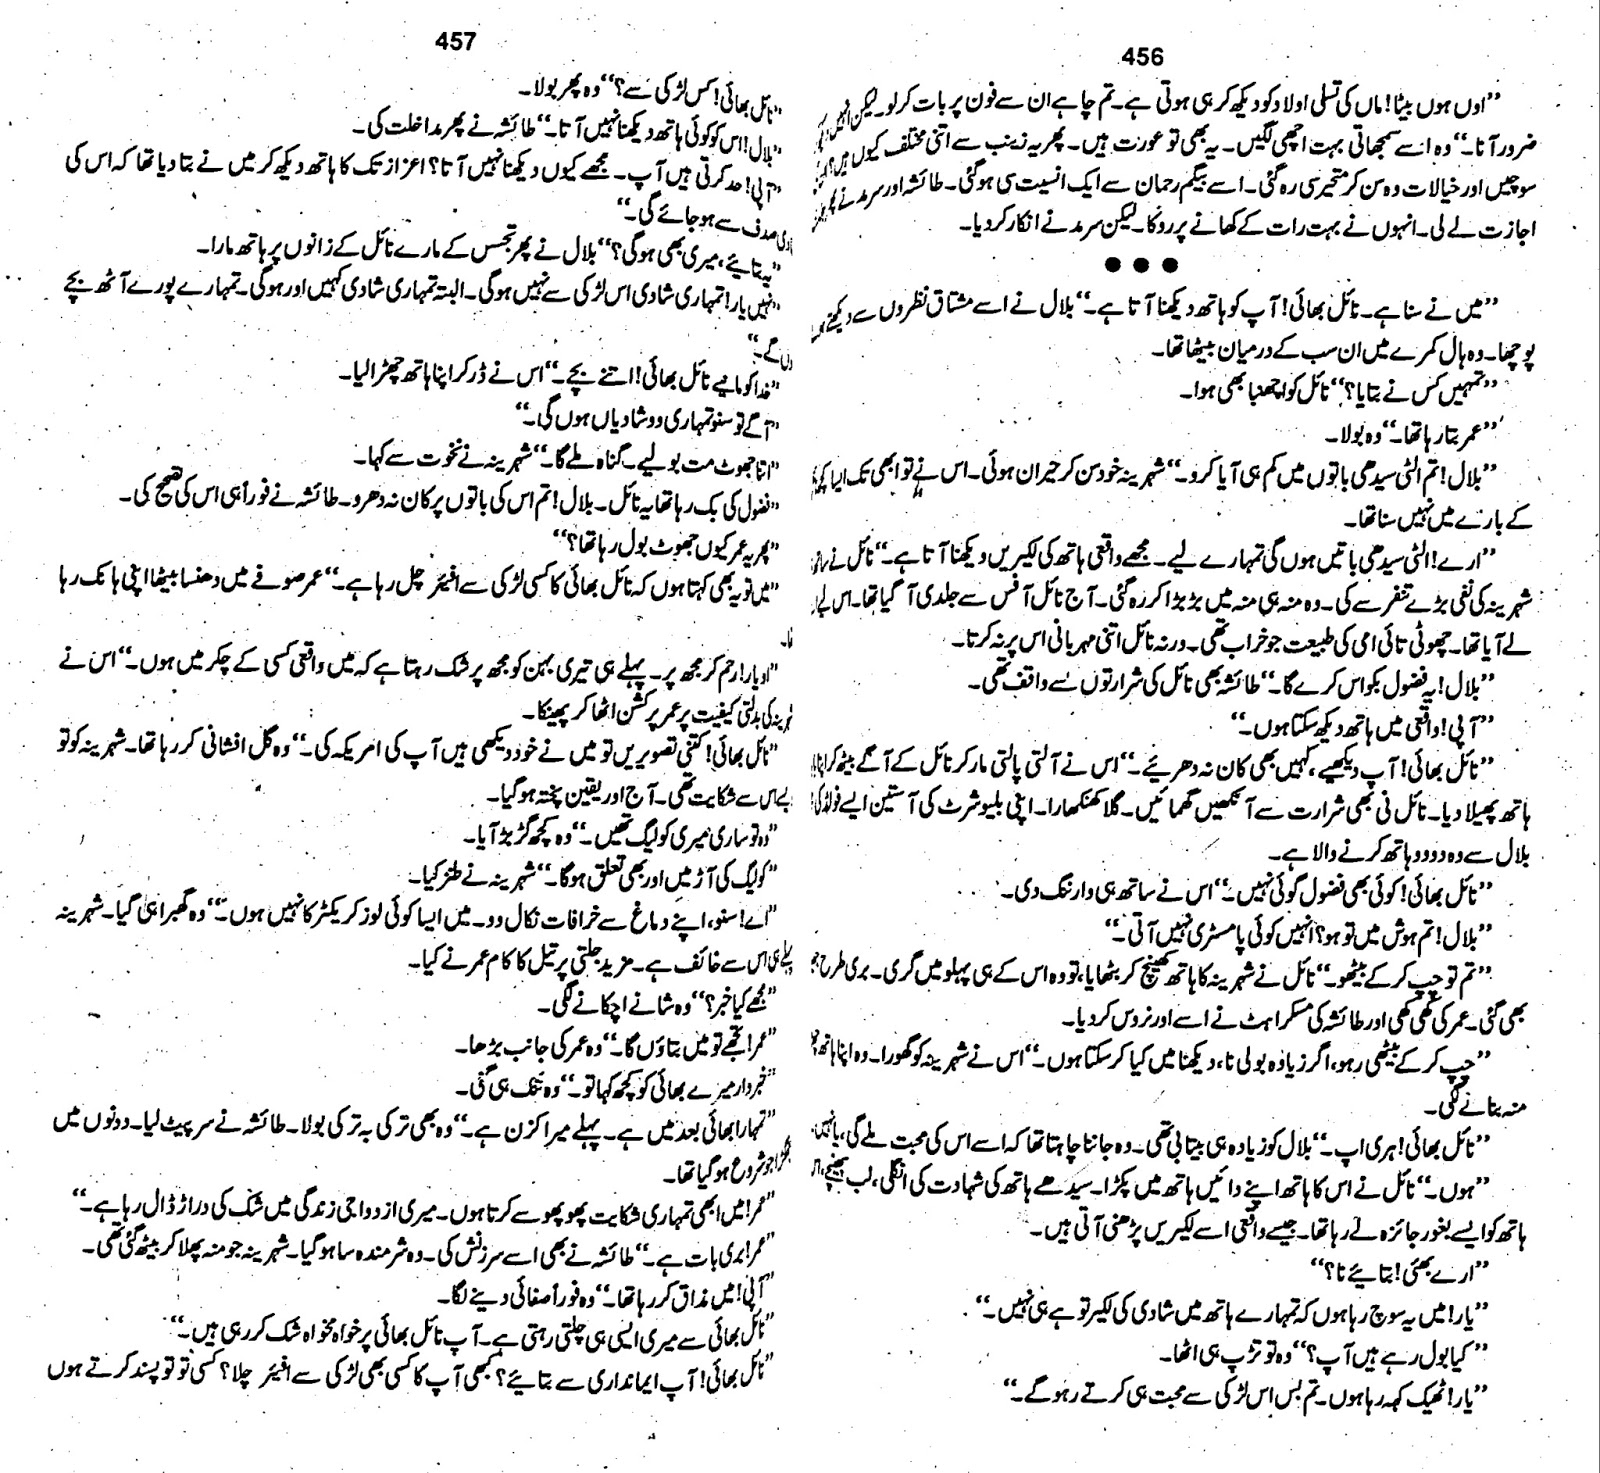 kitab dost mohabbat dil ke sehra main novel by shazia mustafa part 2